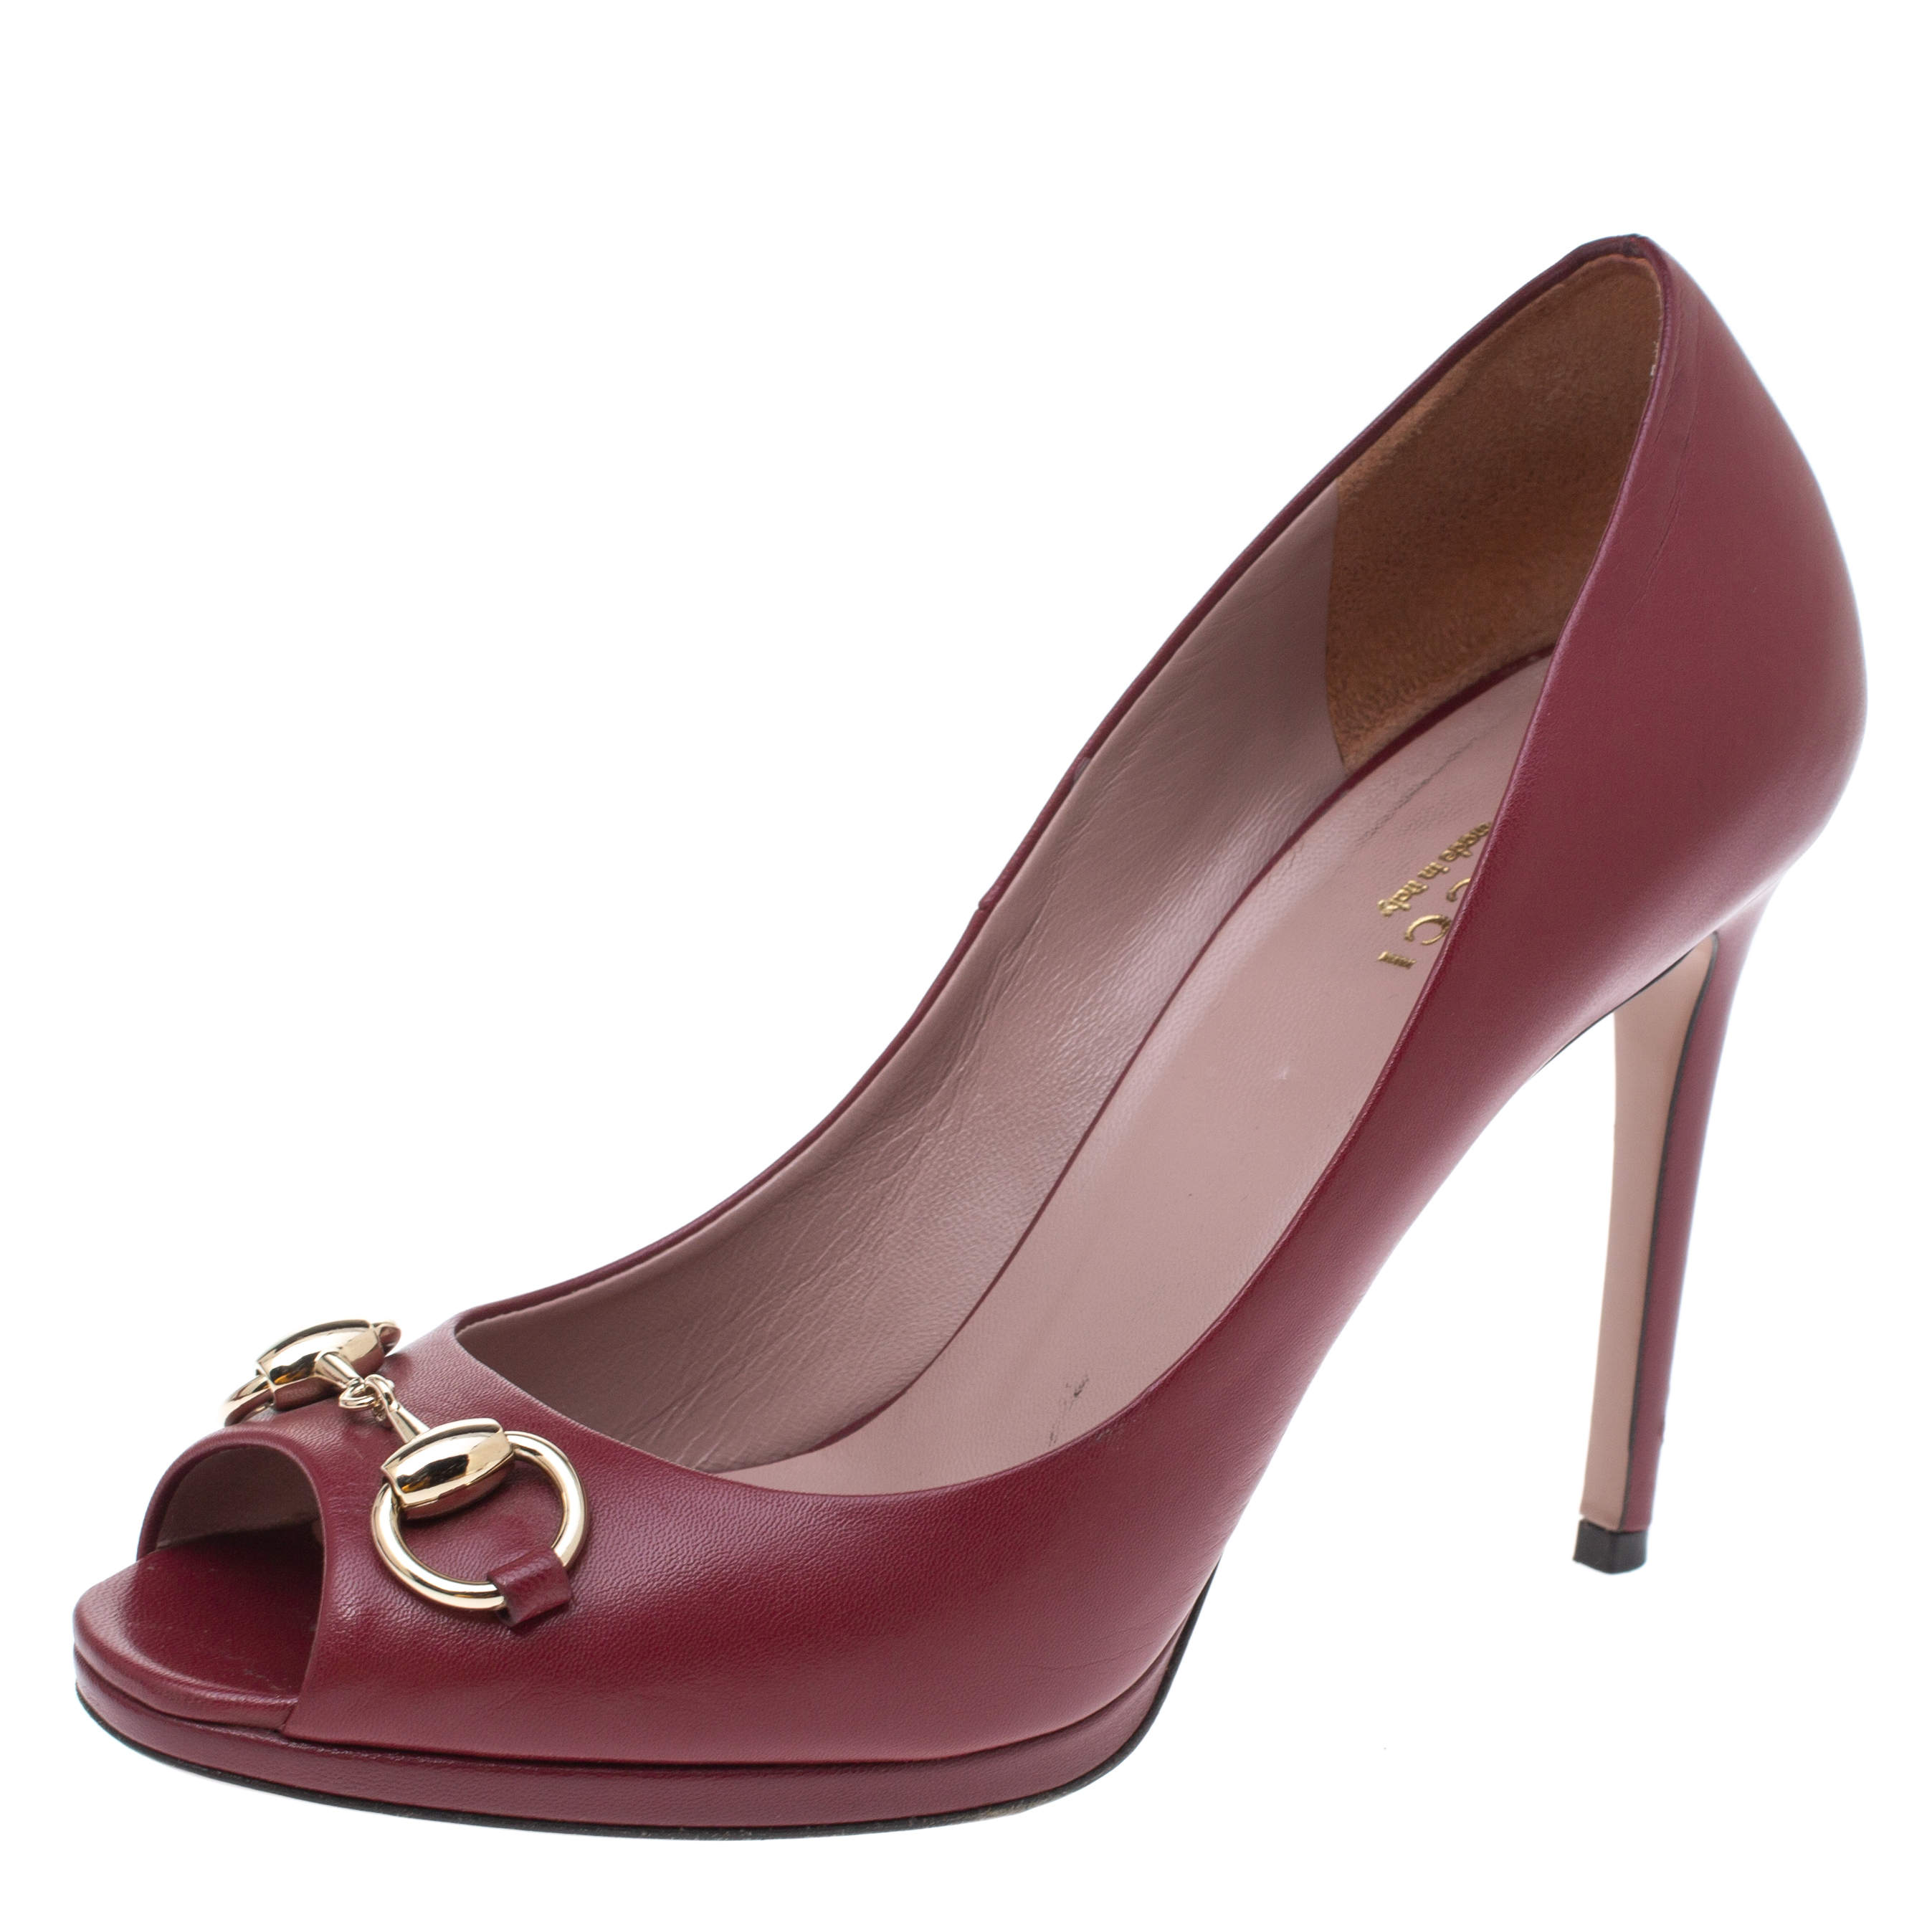 Gucci Burgundy Leather New Hollywood Horsebit Peep Toe Pumps Size 37